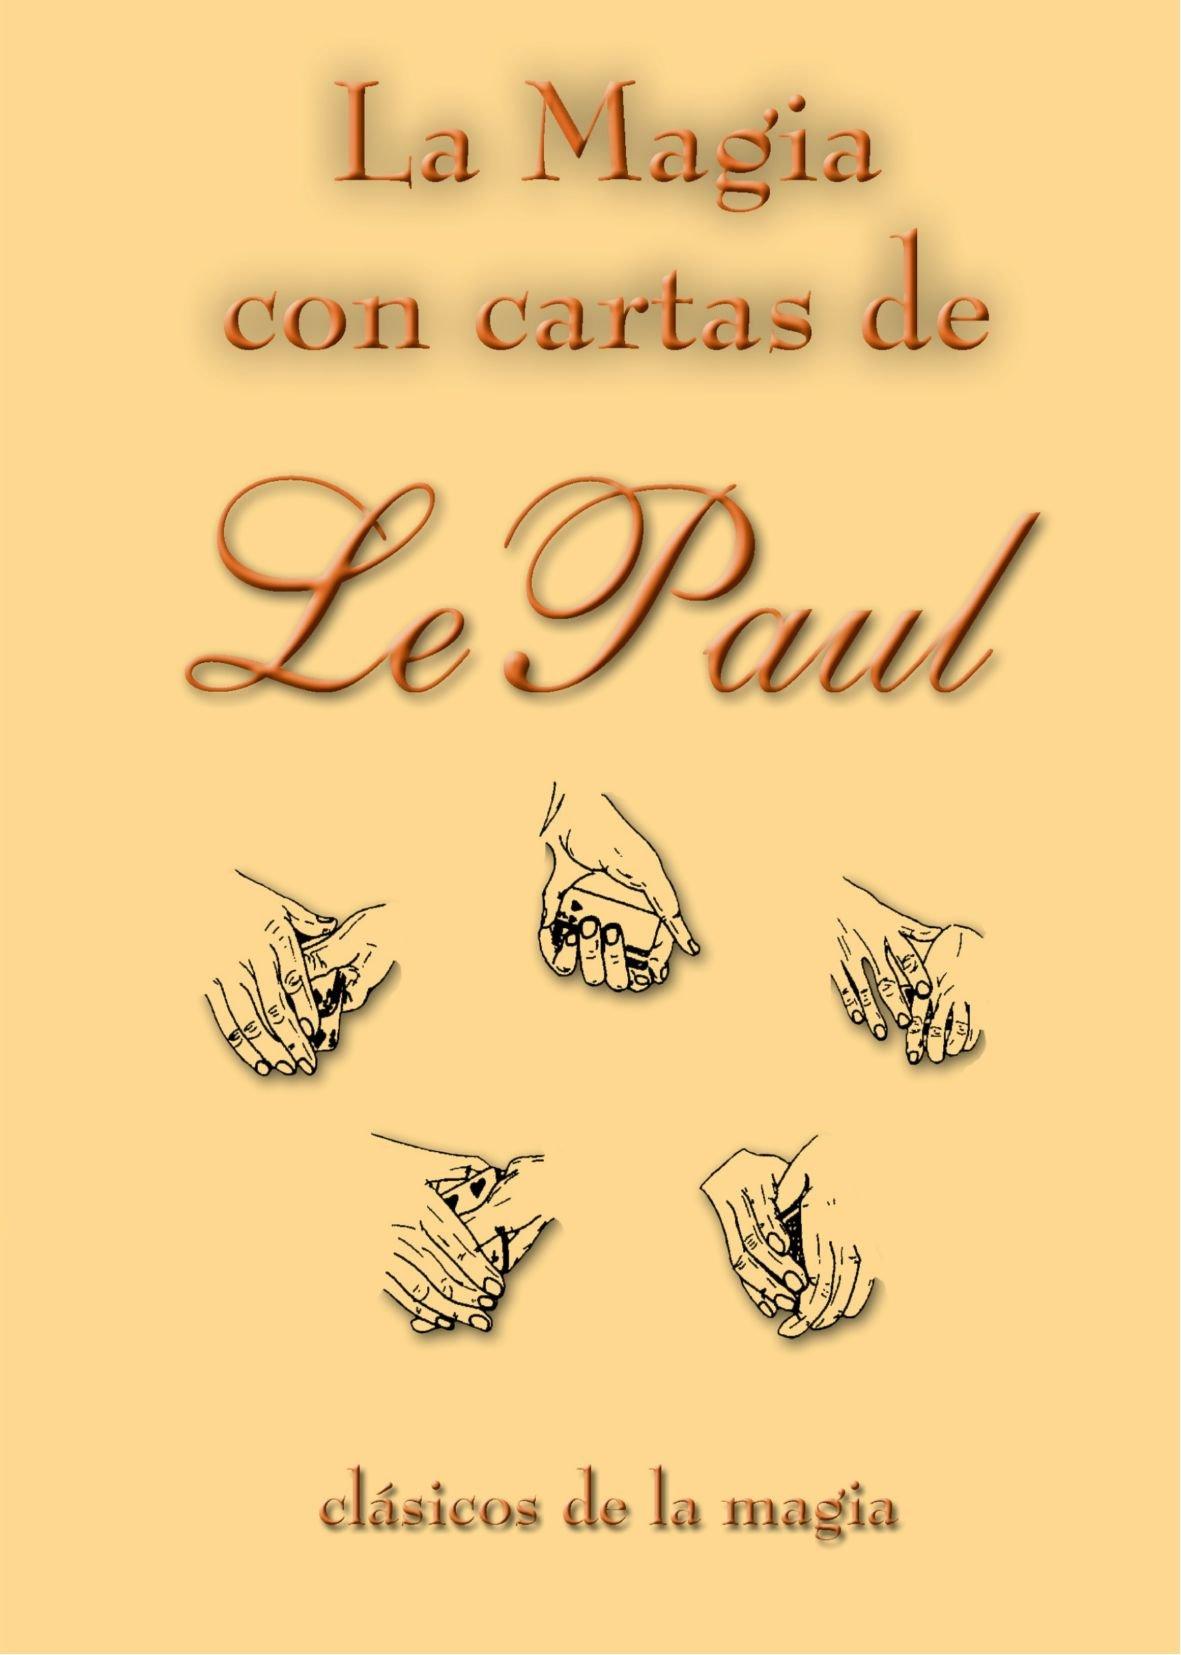 La magia con cartas de lepaul (Spanish Edition): Paul Lepaul ...